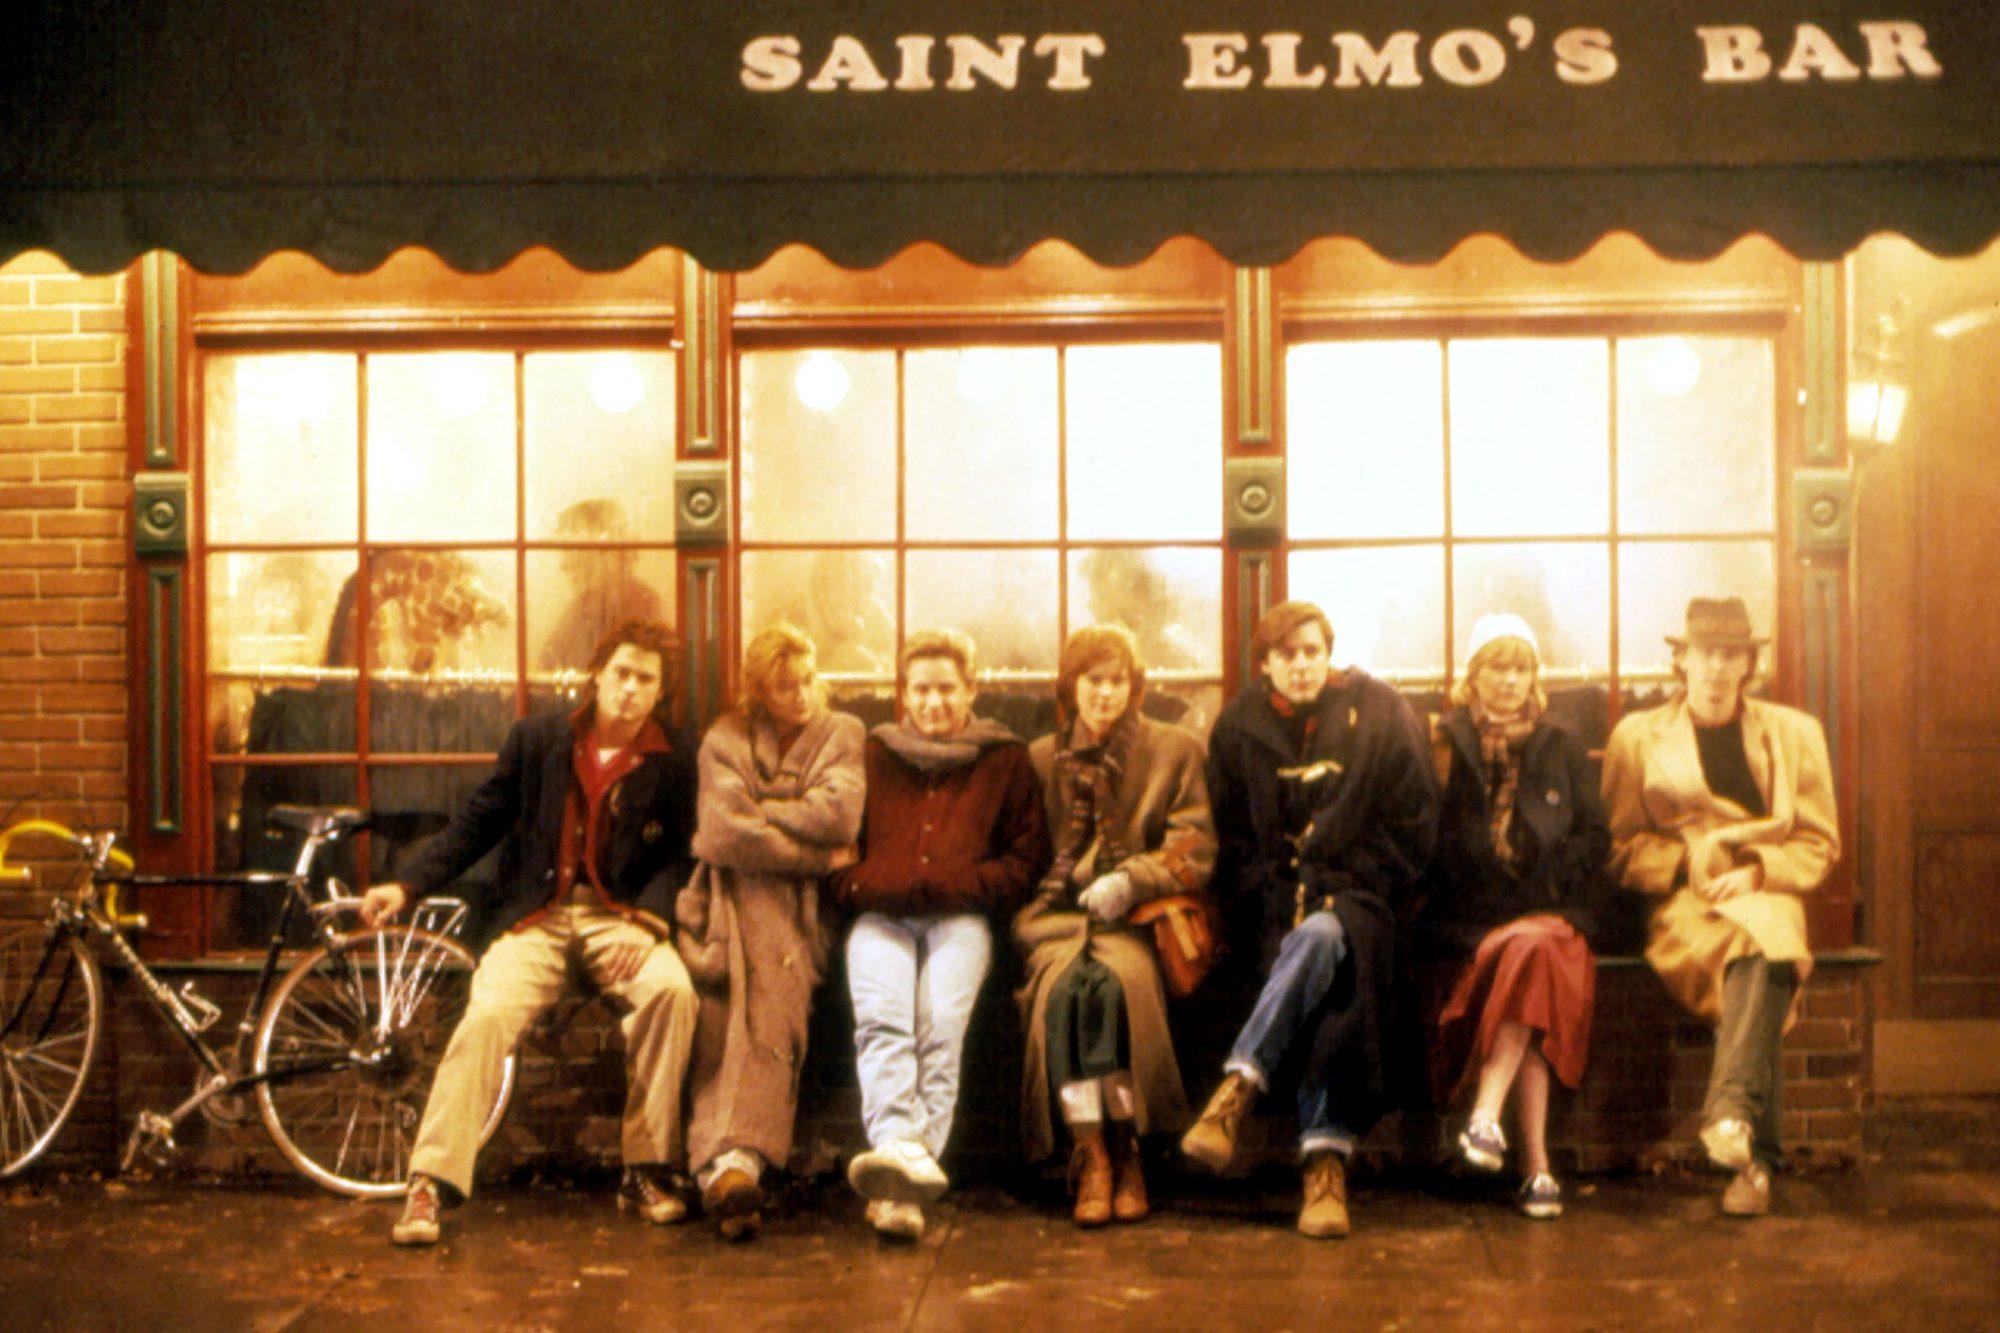 ST. ELMO'S FIRE, Rob Lowe, Demi Moore, Emilio Estevez, Ally Sheedy, Judd Nelson, Mare Winningham, An